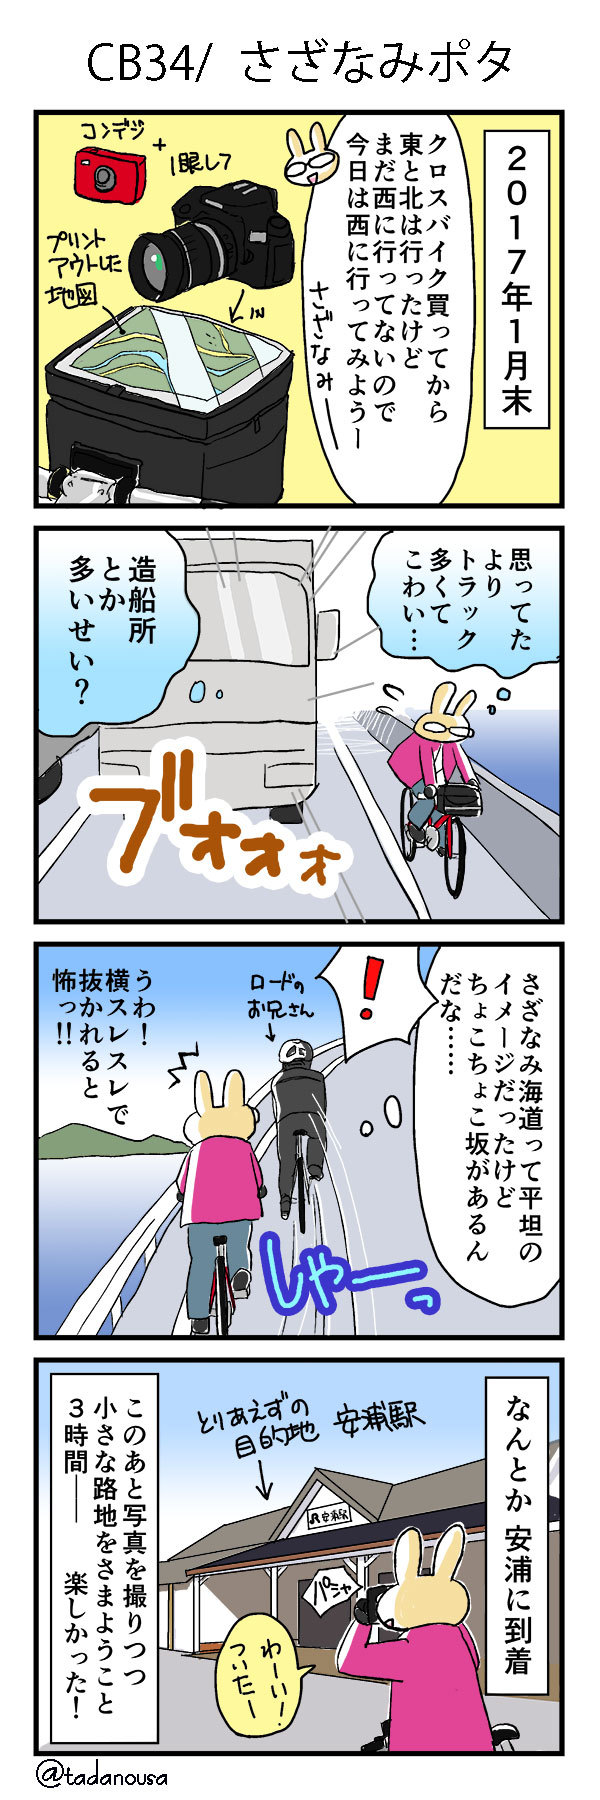 bike_4koma_kako074_s.jpg